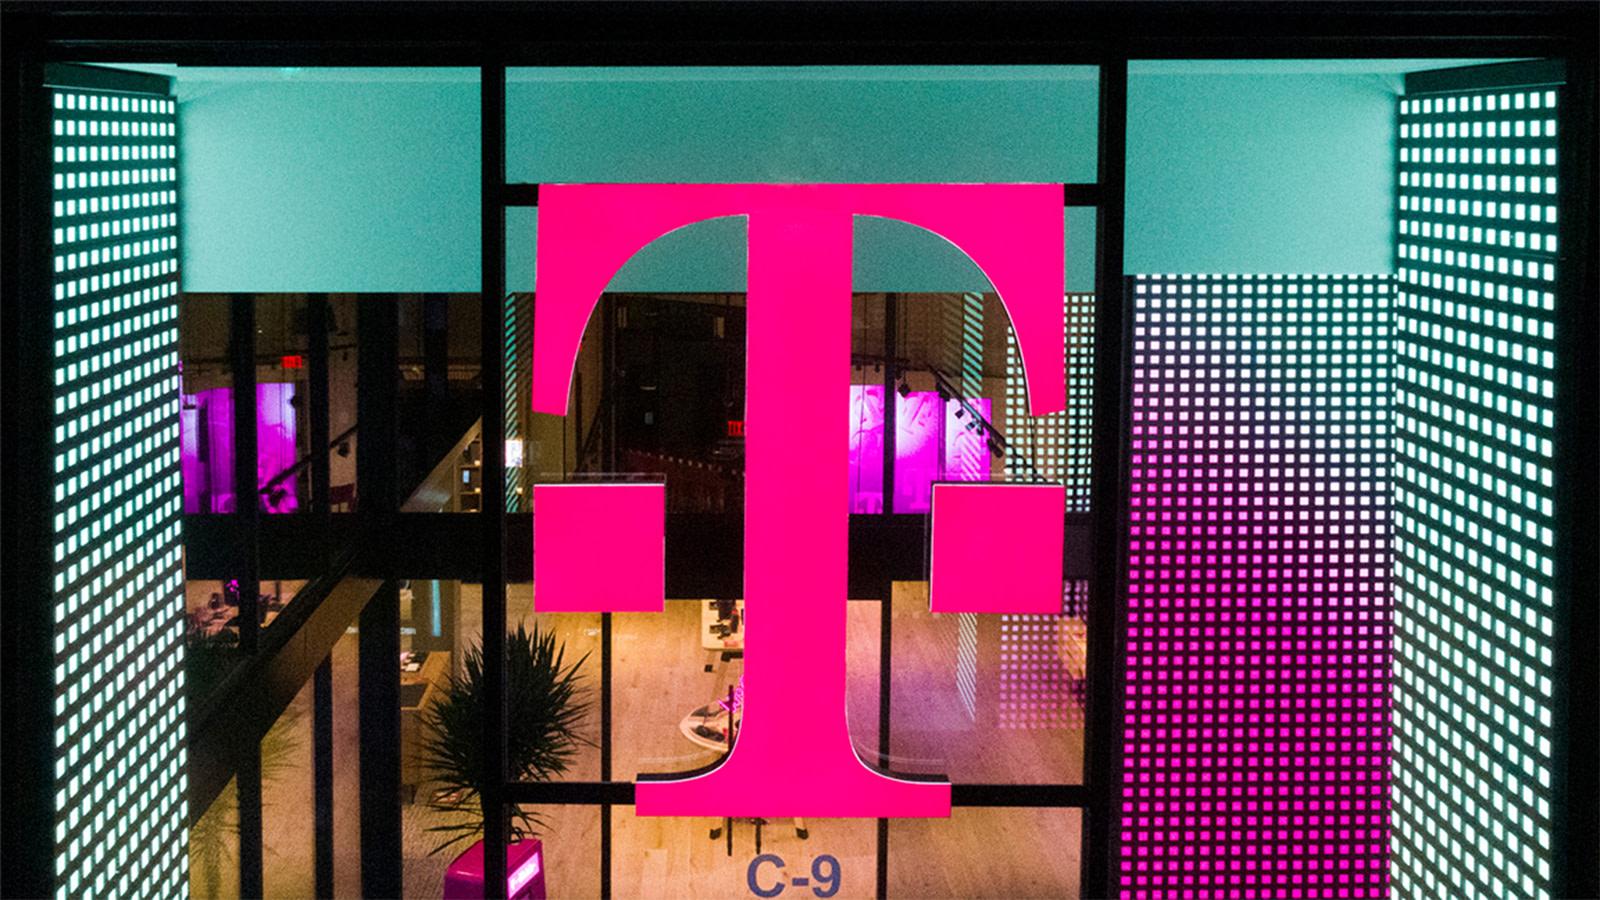 T-Mobile Plano's retail location logo